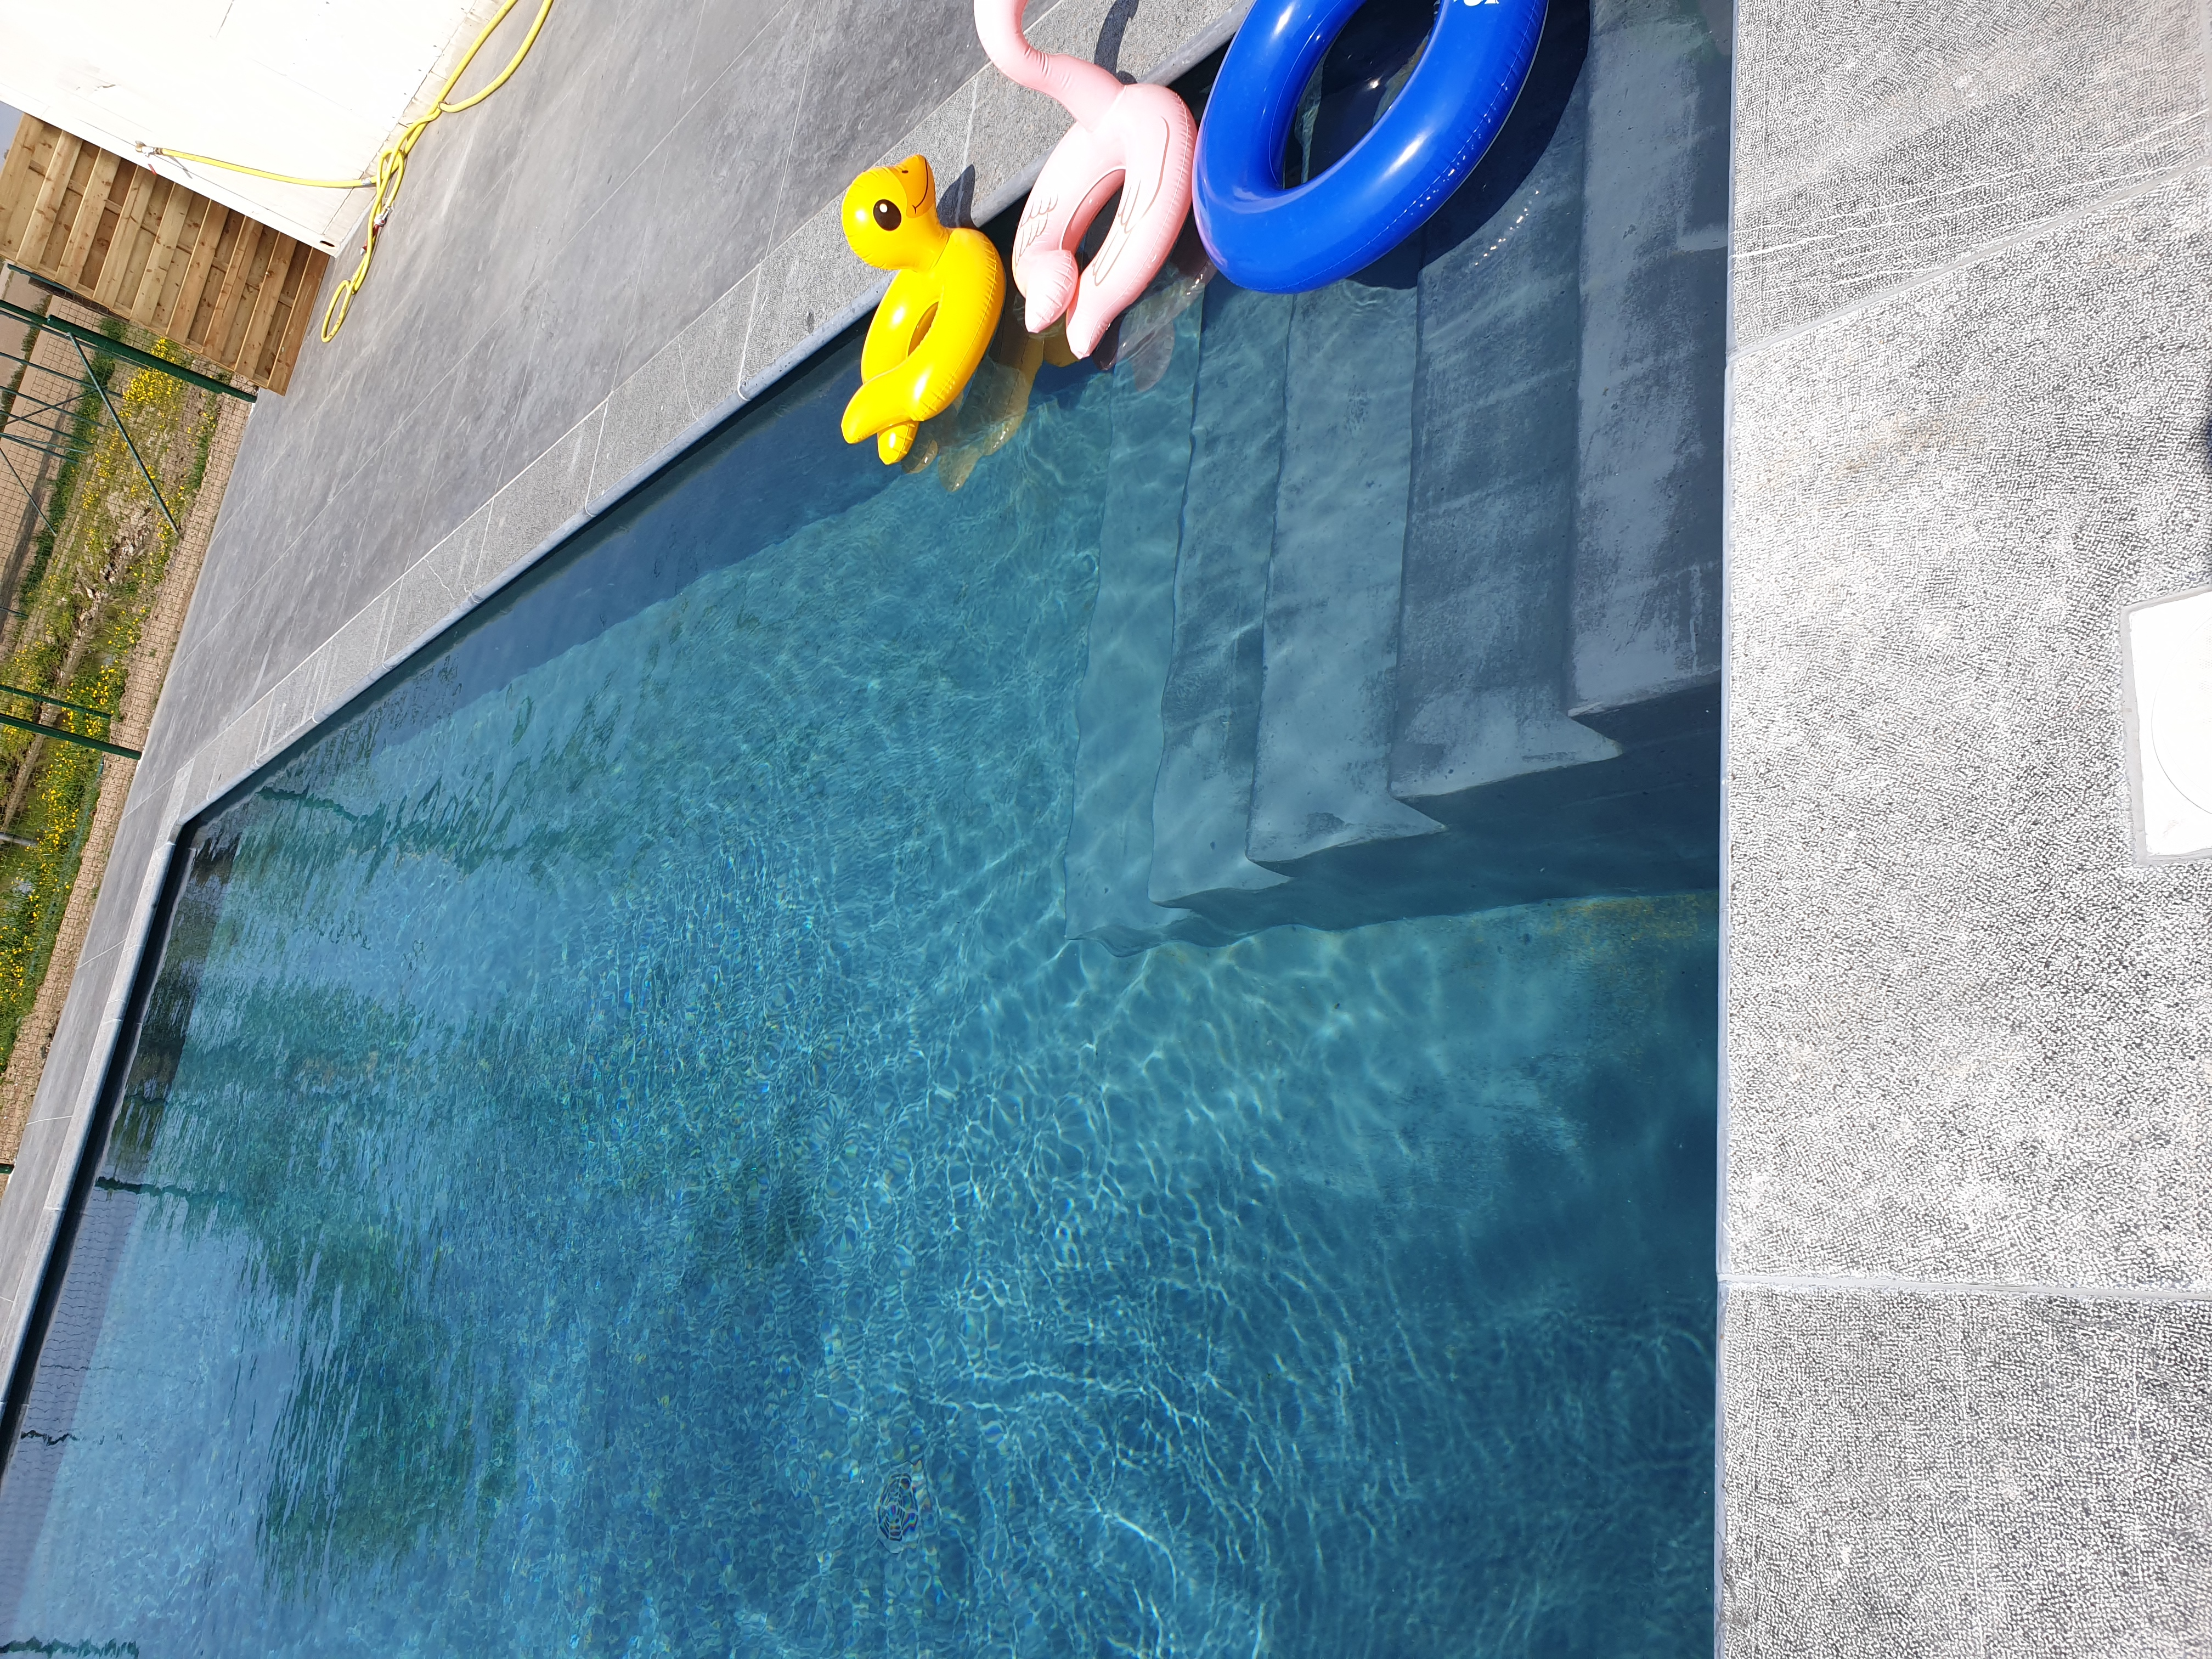 Natuur zwembad